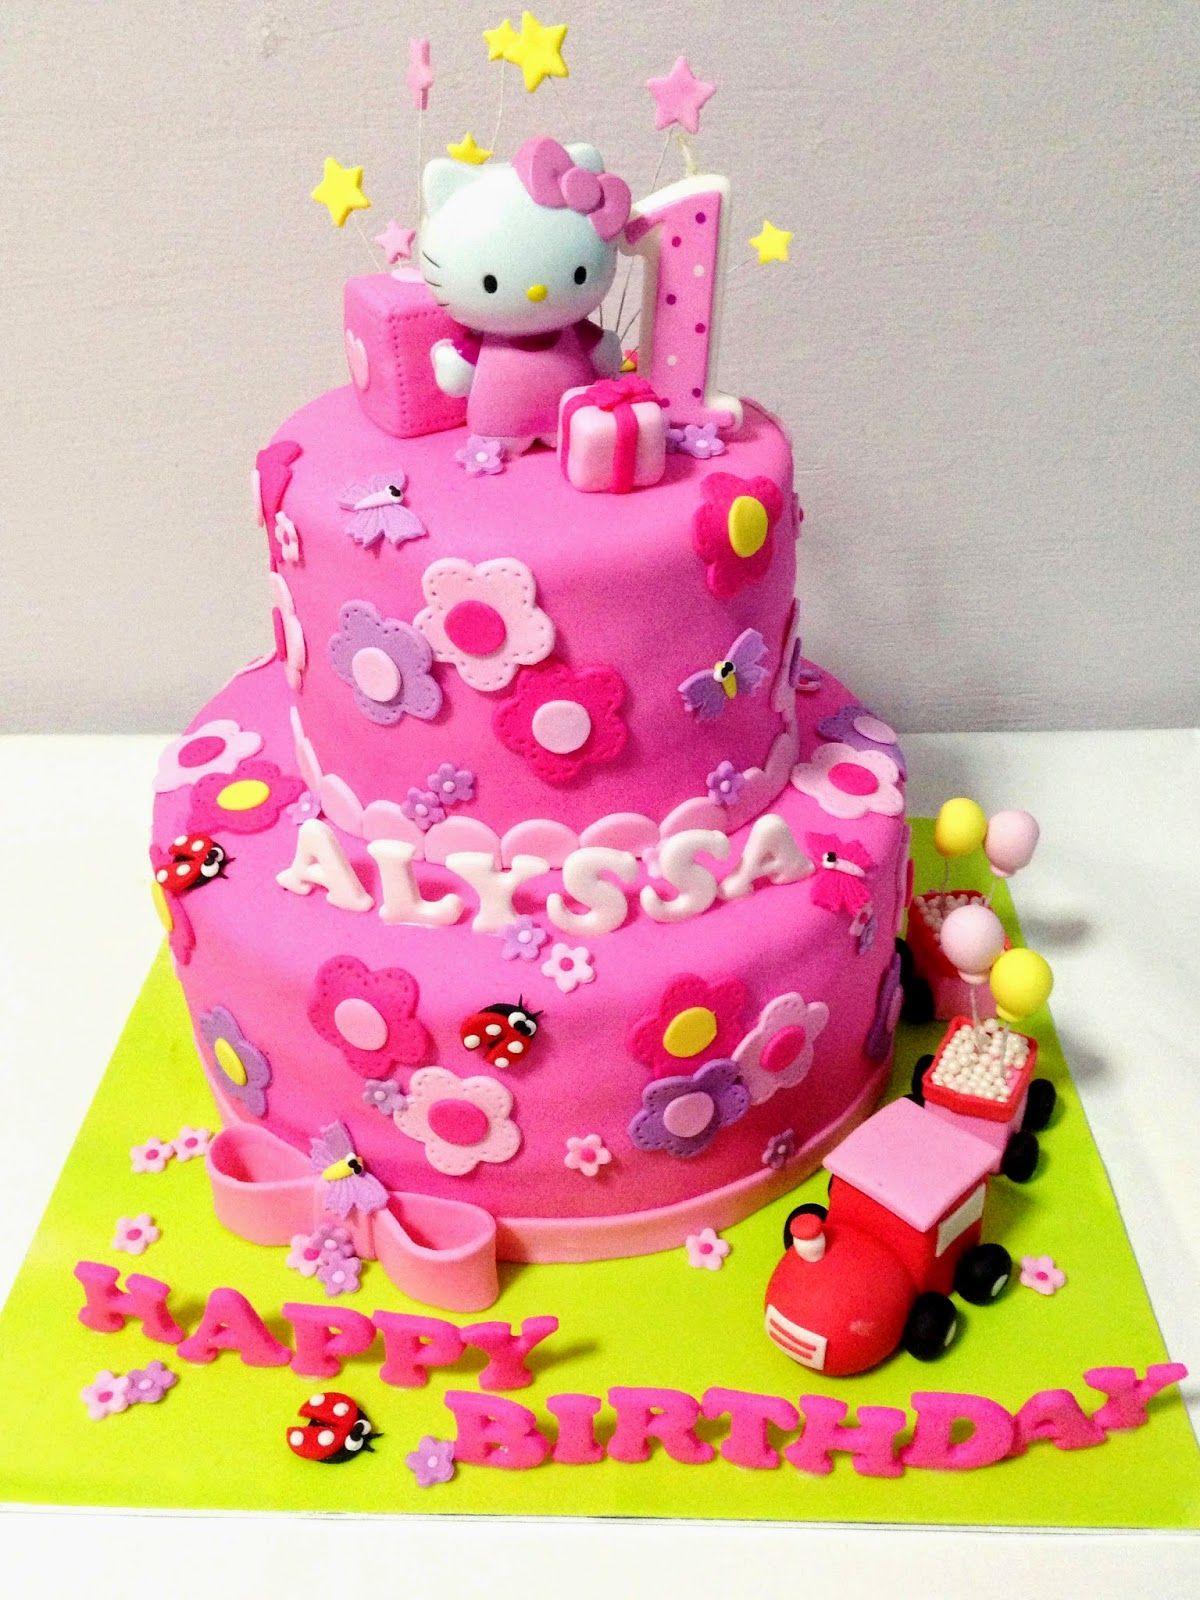 Pleasing Oven Creations Happy 1St Birthday Alyssa Happy Birthday Alyssa Funny Birthday Cards Online Hetedamsfinfo